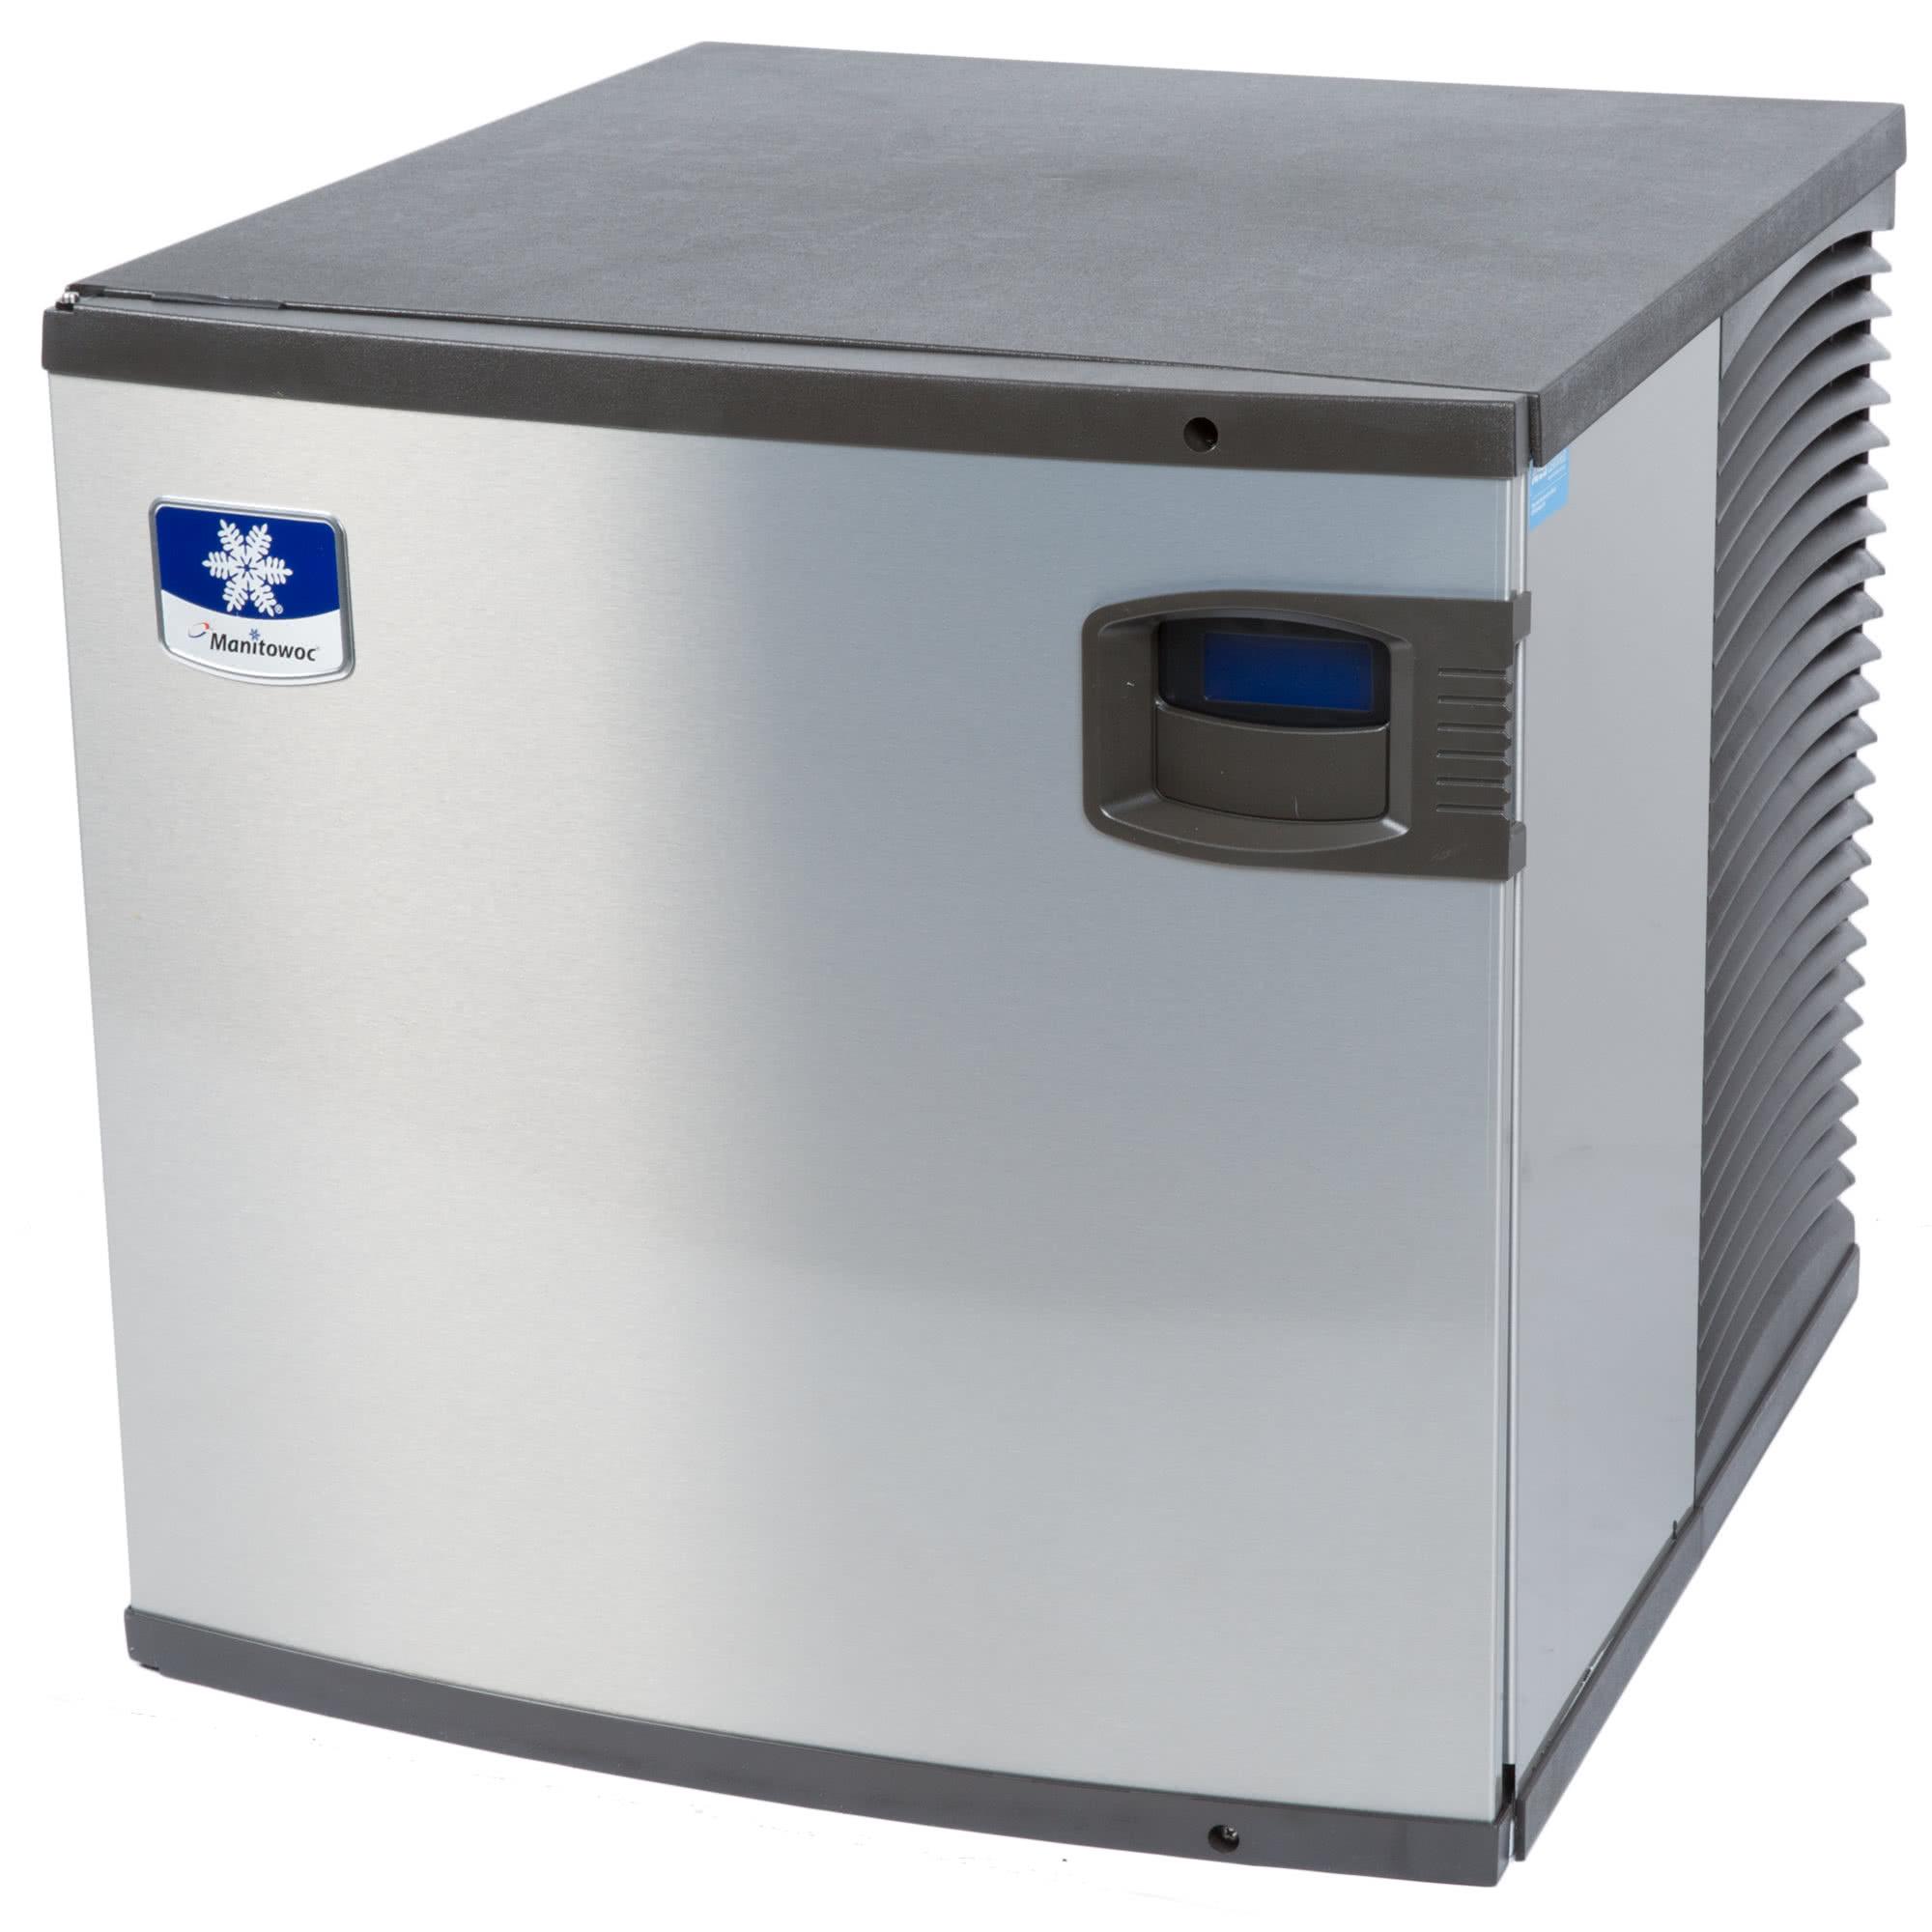 Id 0322a Manitowoc Indigo Series Ice Maker 350 Lb Dice Cube Air Coo